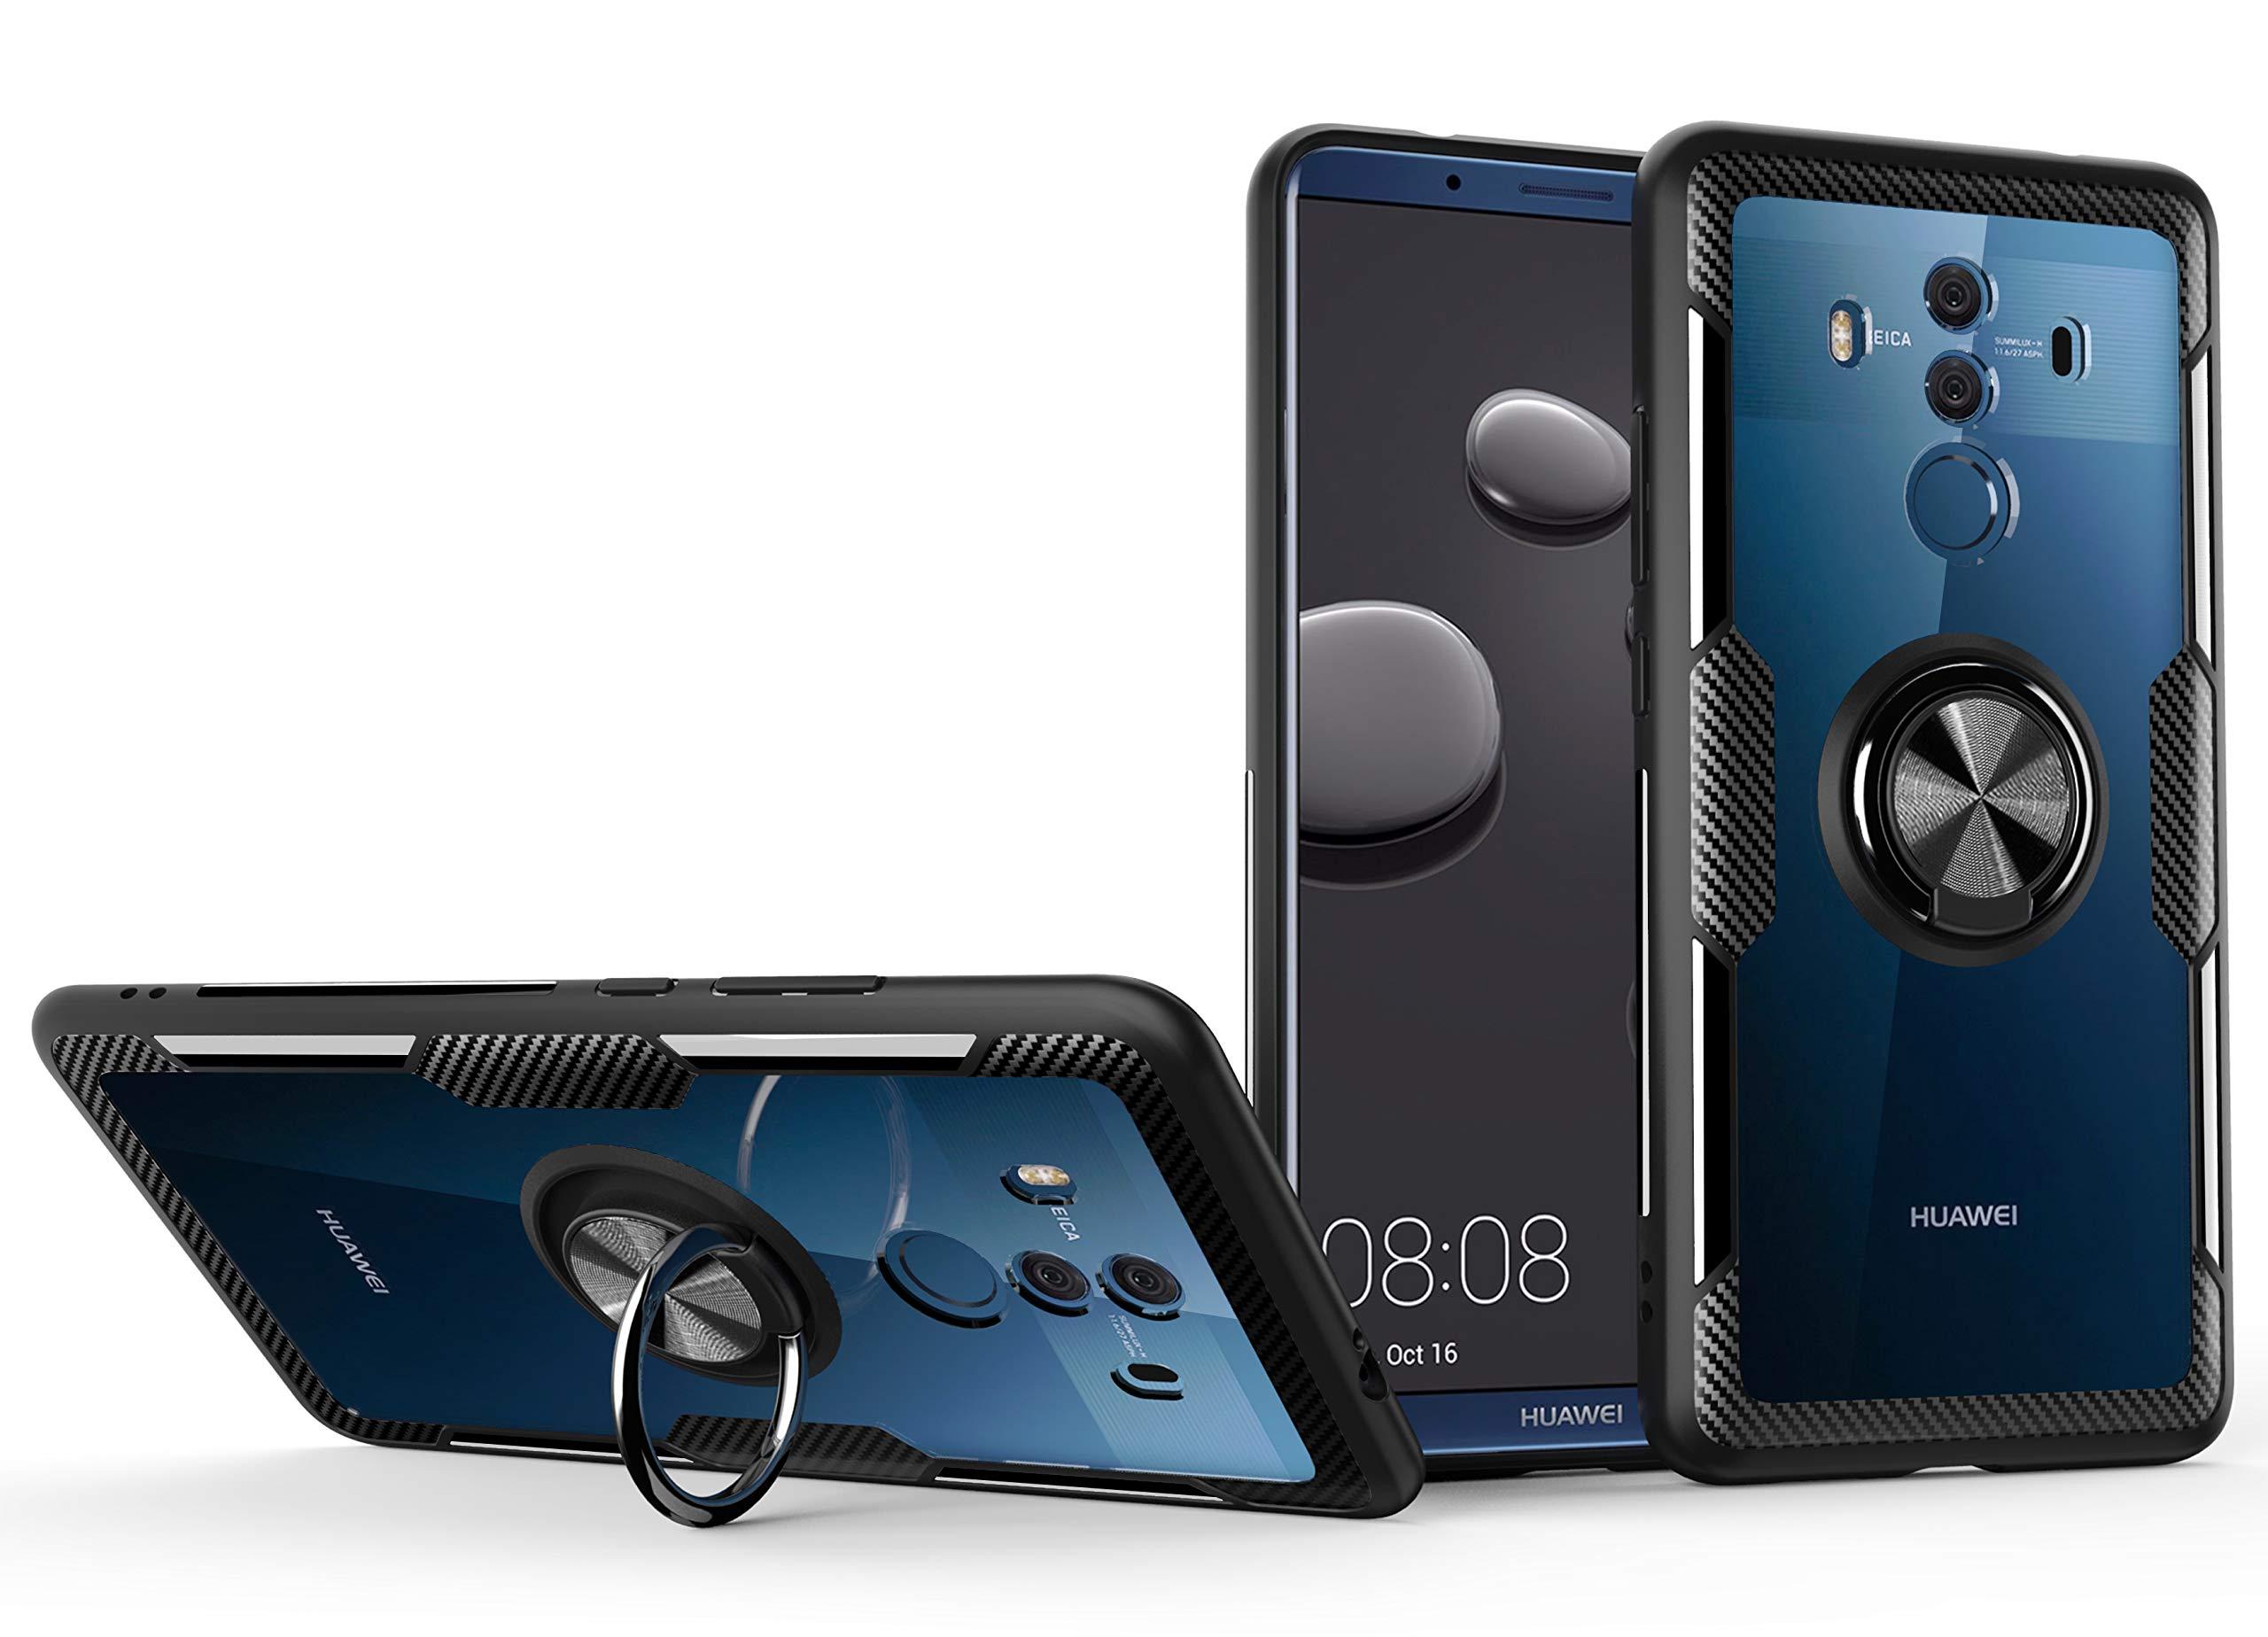 SORAKA Funda Transparente para Huawei Mate 10 Pro con Anillo Giratorio de 360 Grados Cubierta Transparente de PC Dura+Parachoques de Silicona,con Placa de Metal para Soporte Móvil Coche Magnético: Amazon.es: Electrónica